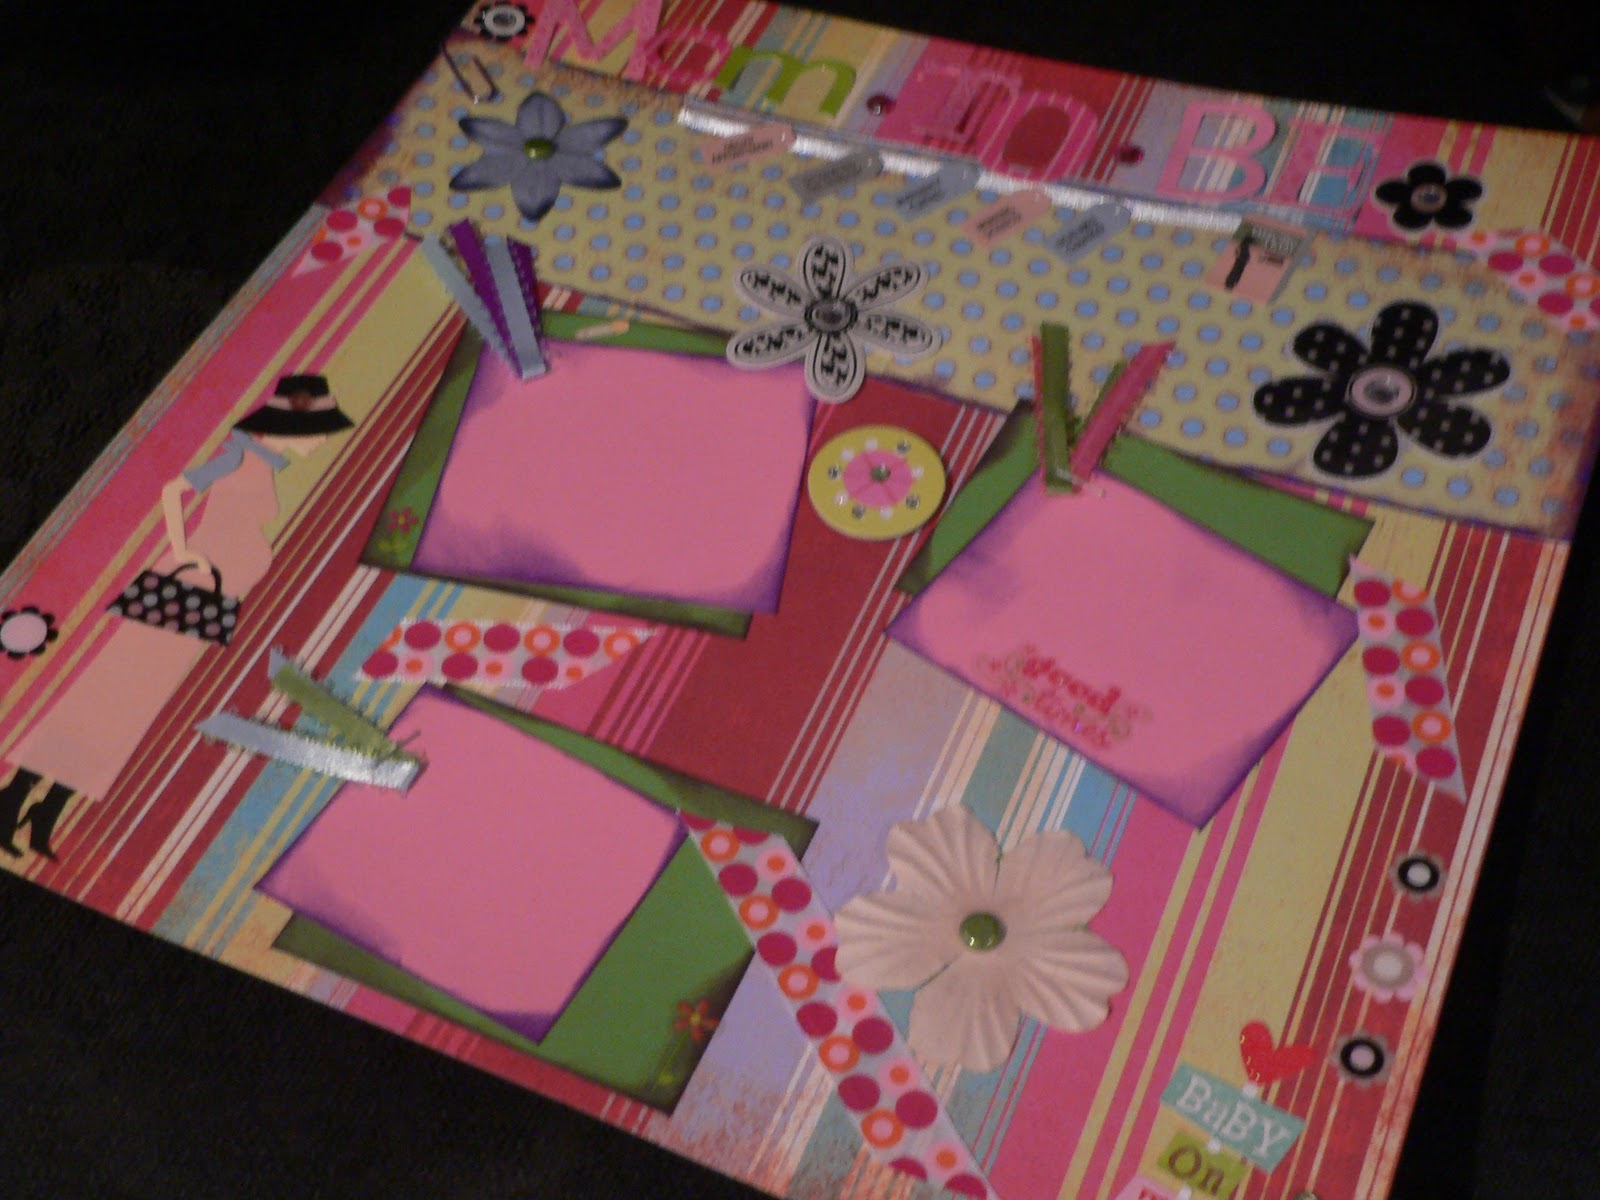 Scrapbook ideas for baby girl - Posh 5 003 Jpg